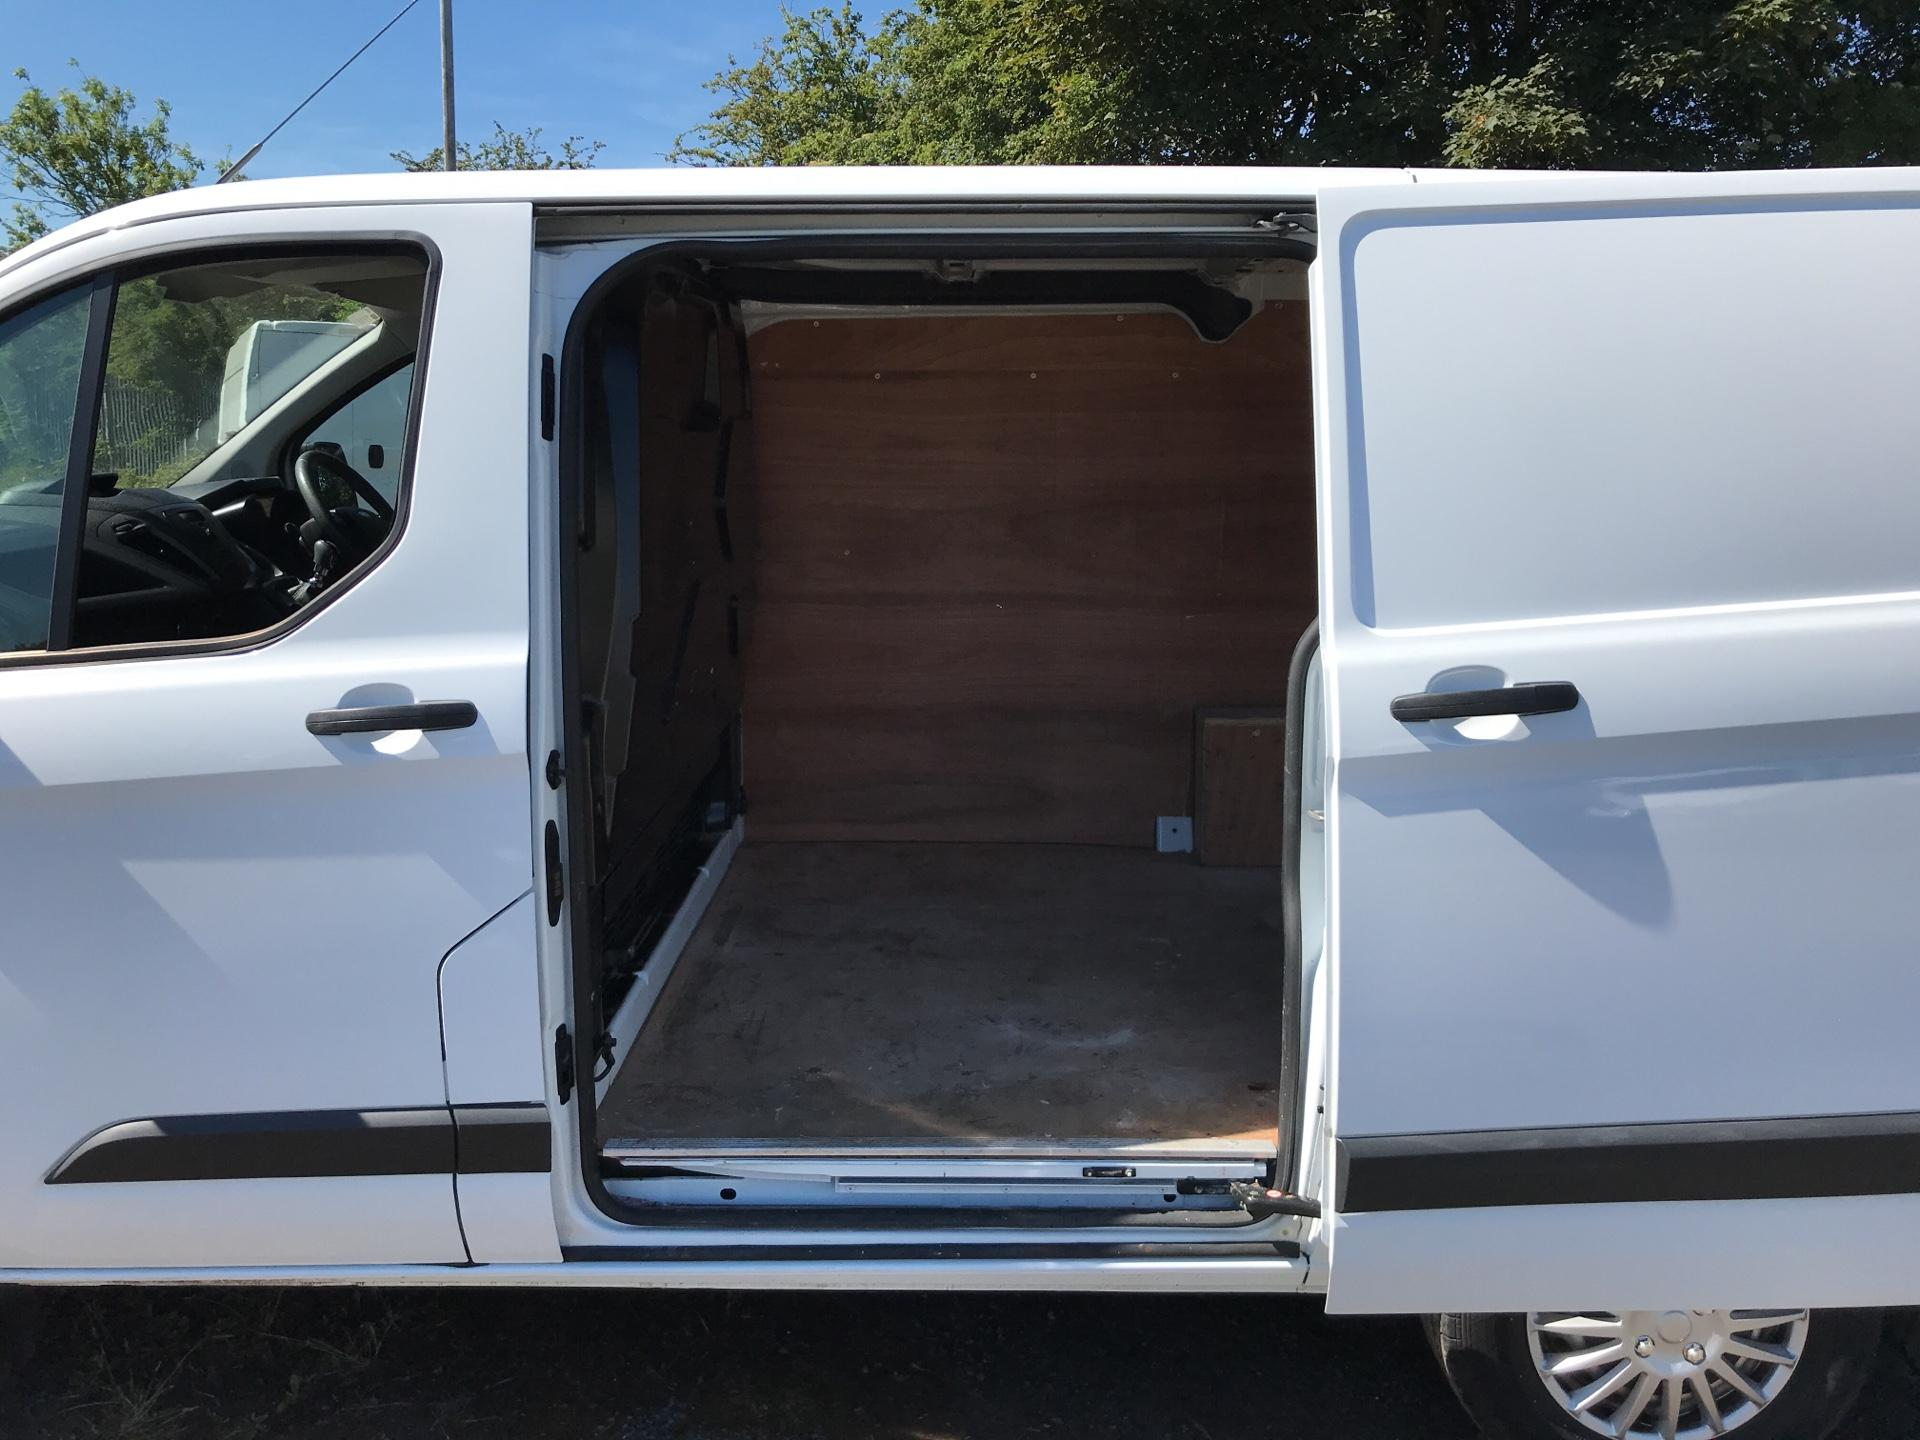 2014 Ford Transit Custom 270 L1 DIESEL FWD 2.2 Tdci 100Ps Low Roof Van EURO 5 (SG64ZHB) Image 19